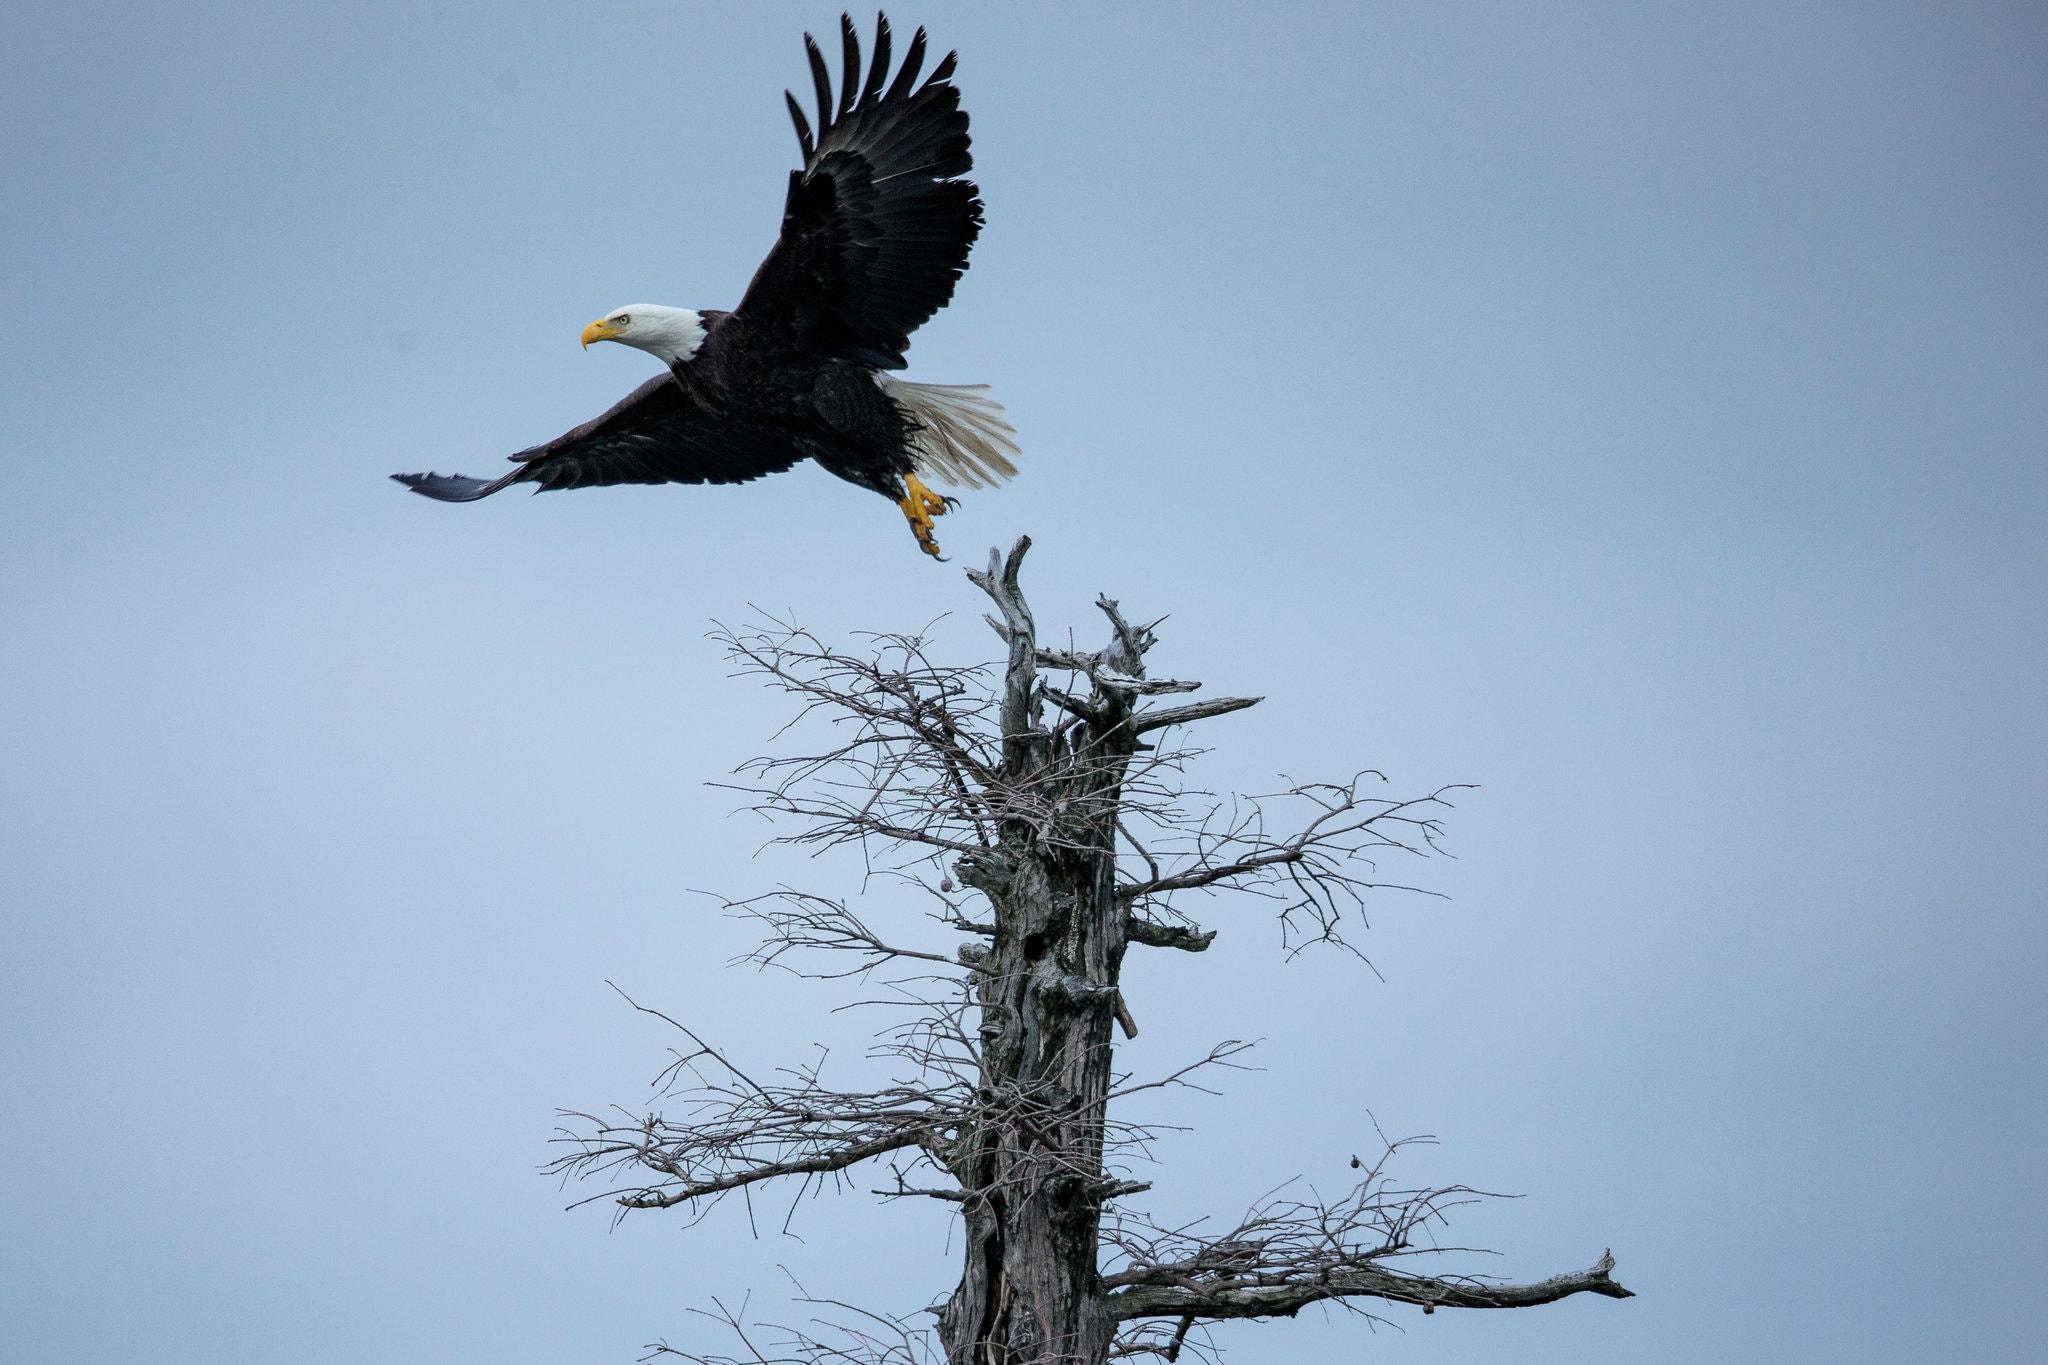 Eagle flying away